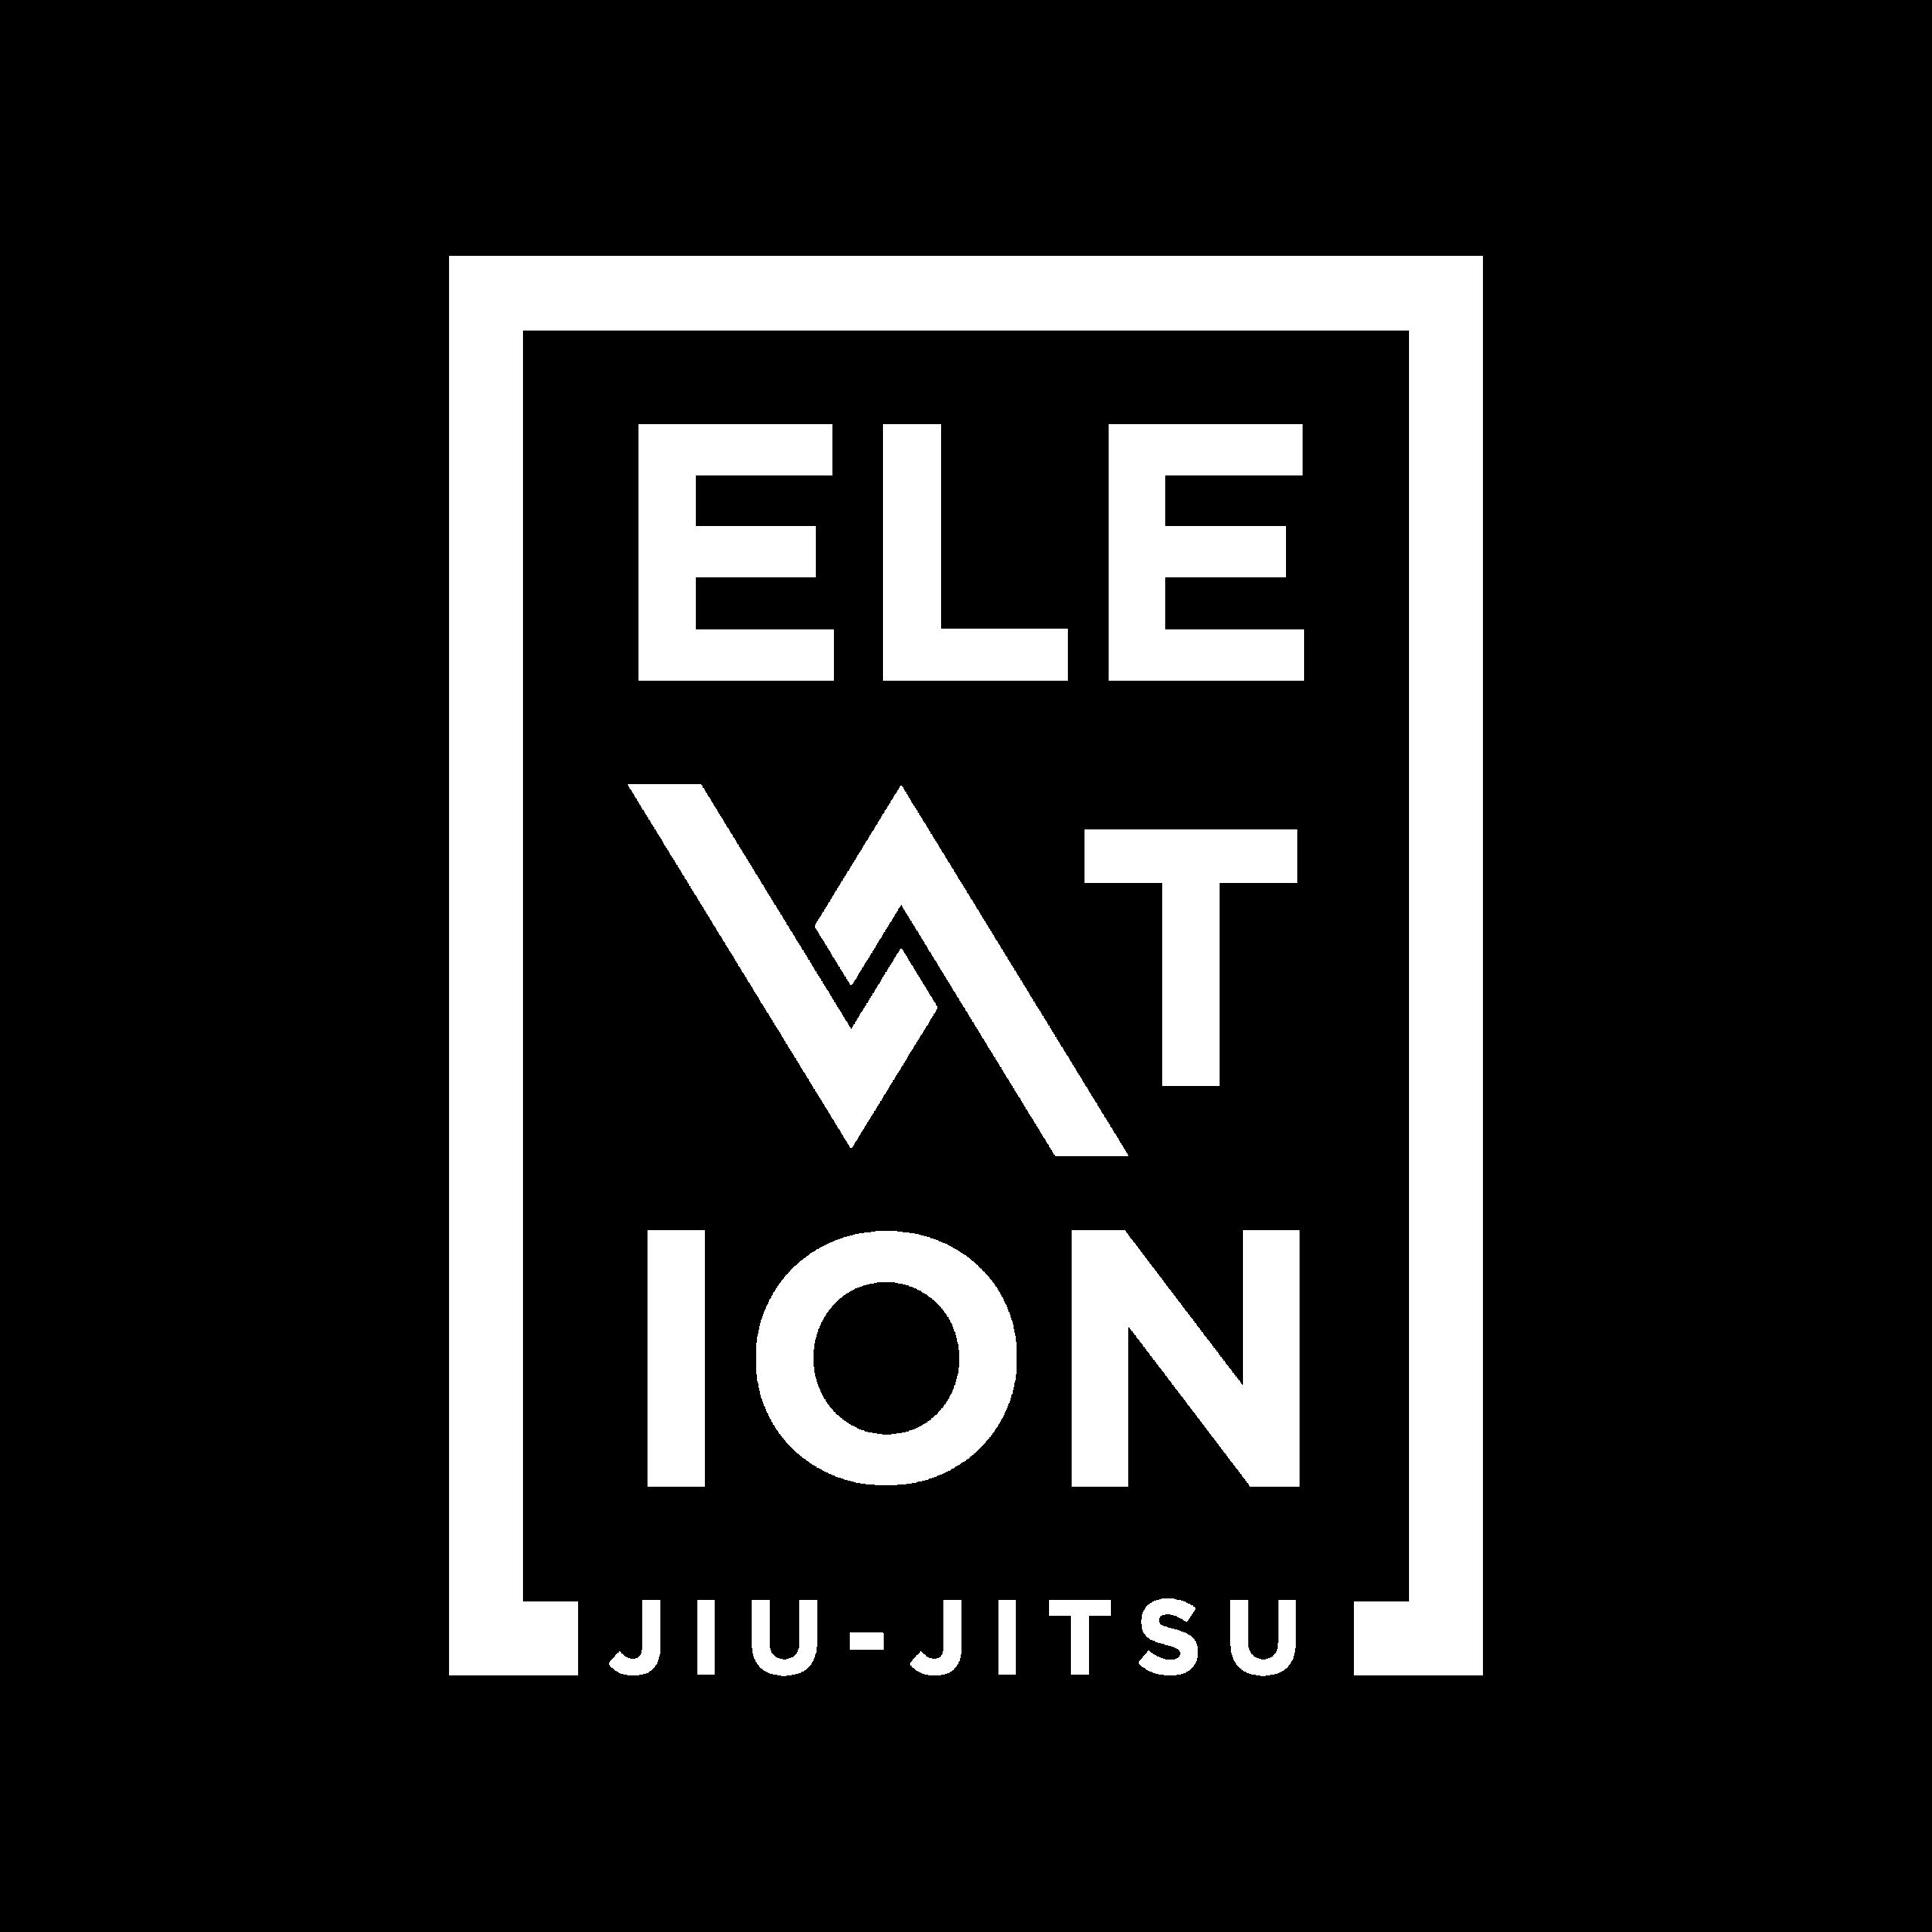 Elevation Jiu Jitsu Utrecht - BJJ Utrecht - Braziliaans Jiu Jitsu logo - Grappling Utrecht